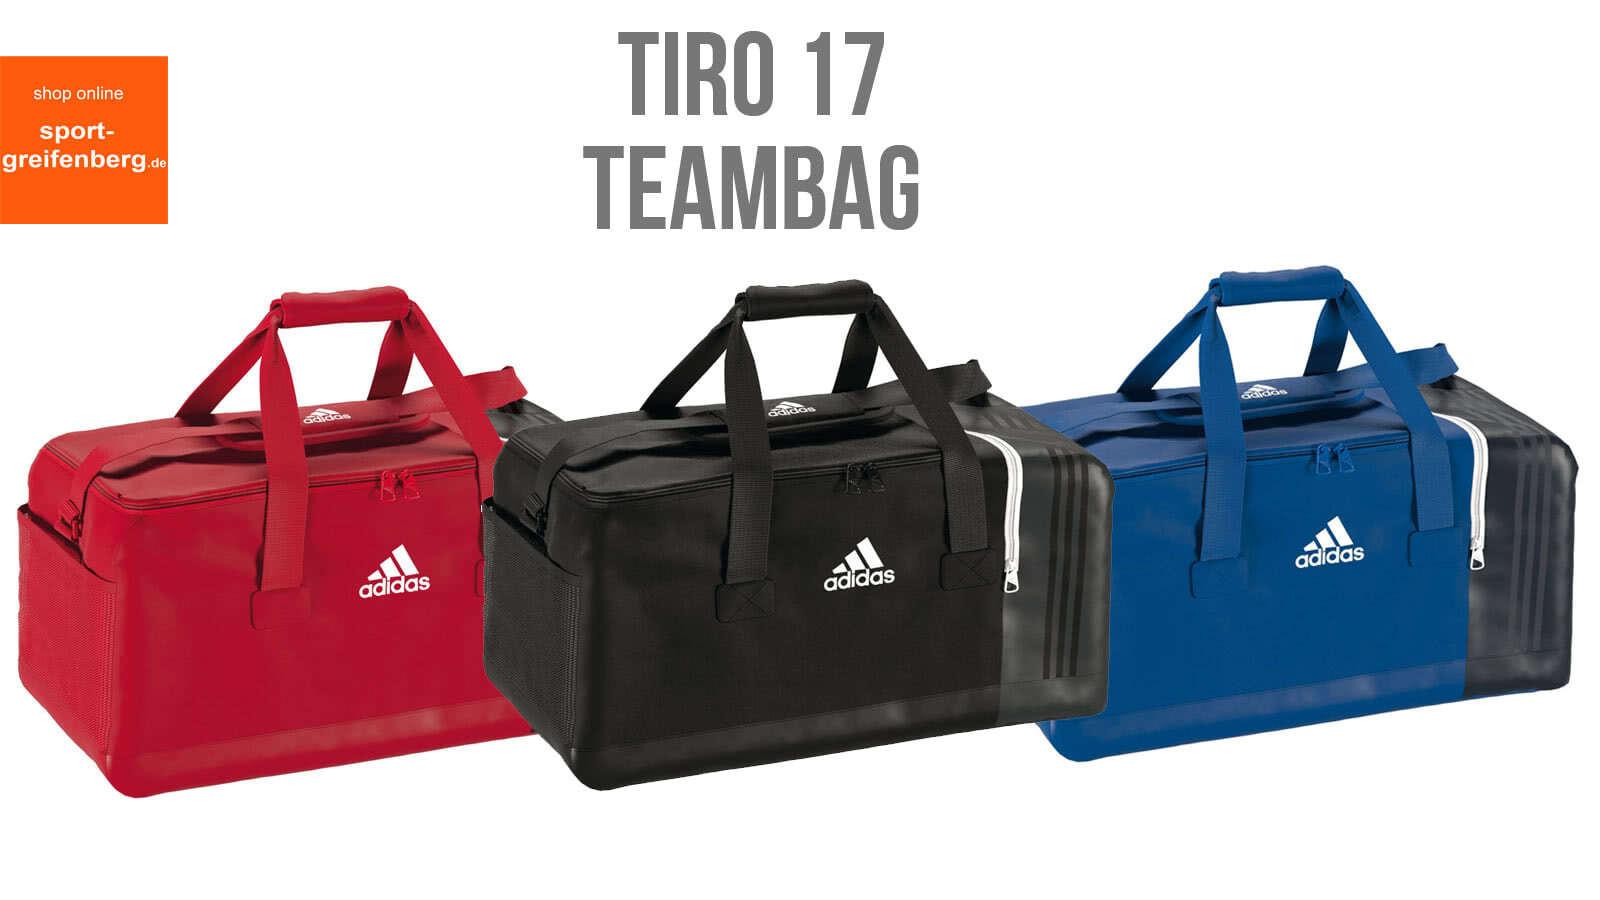 525f7e6135b26 Adidas Tiro 17 Teambag Sporttasche für 2017 2018